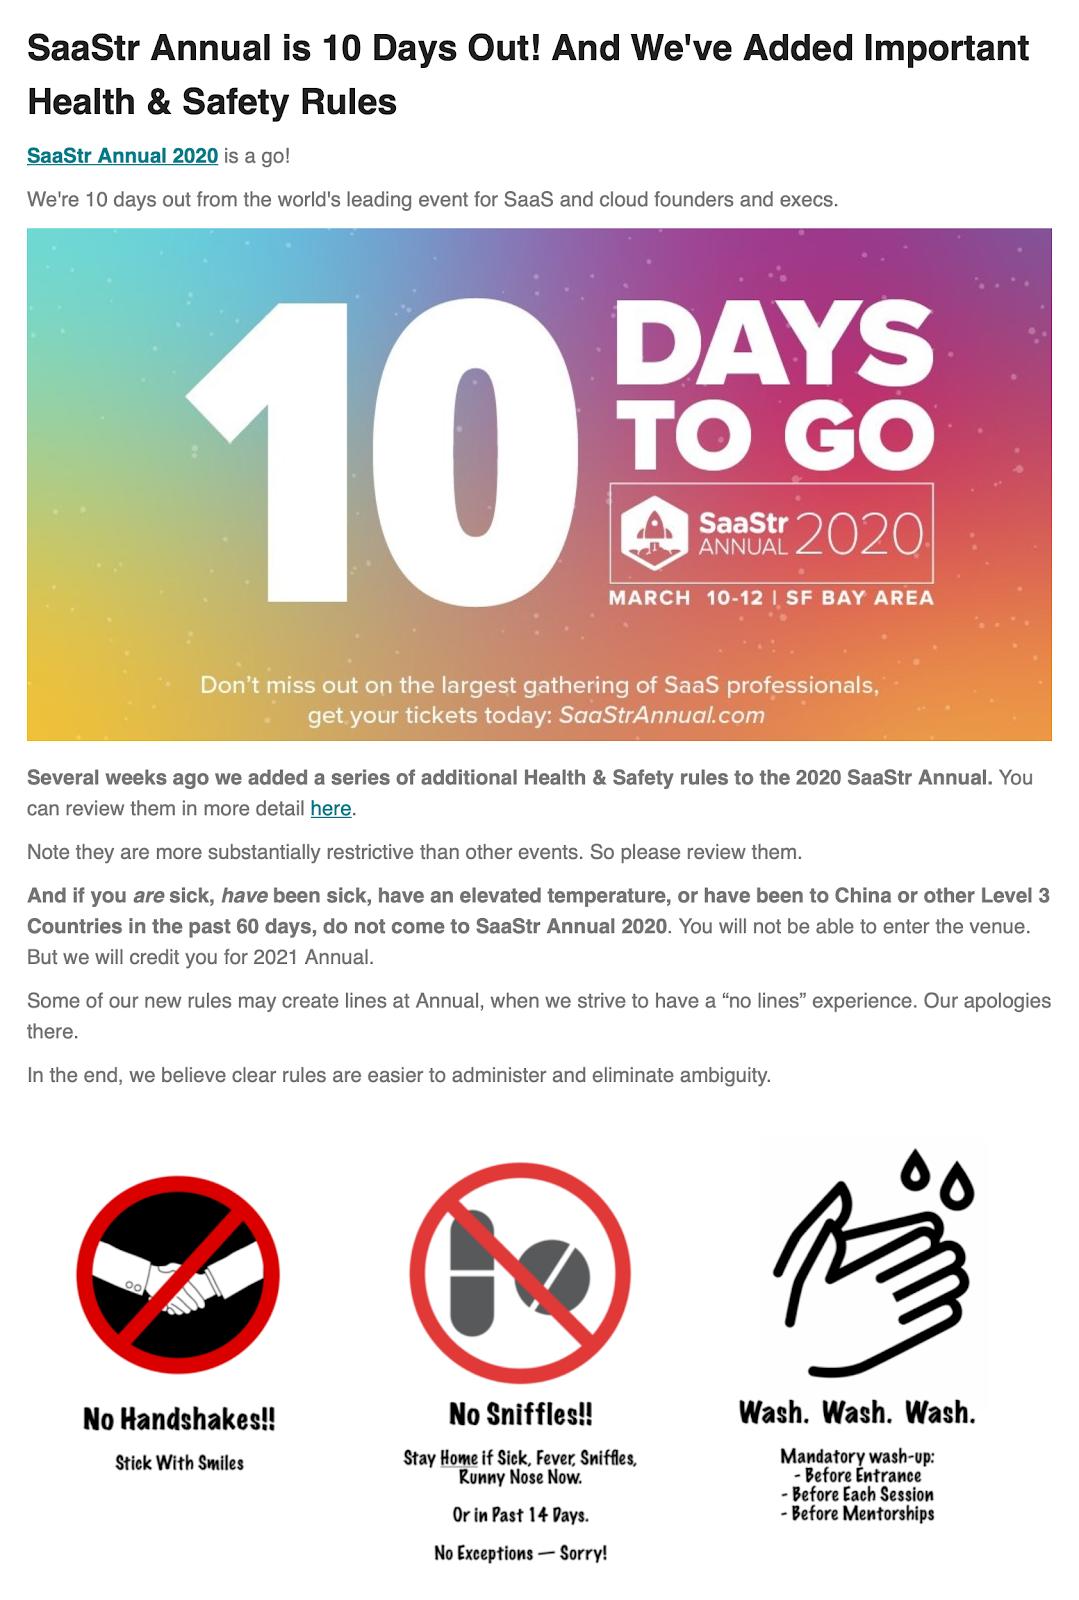 SaaStr Annual Health & Safety Rules